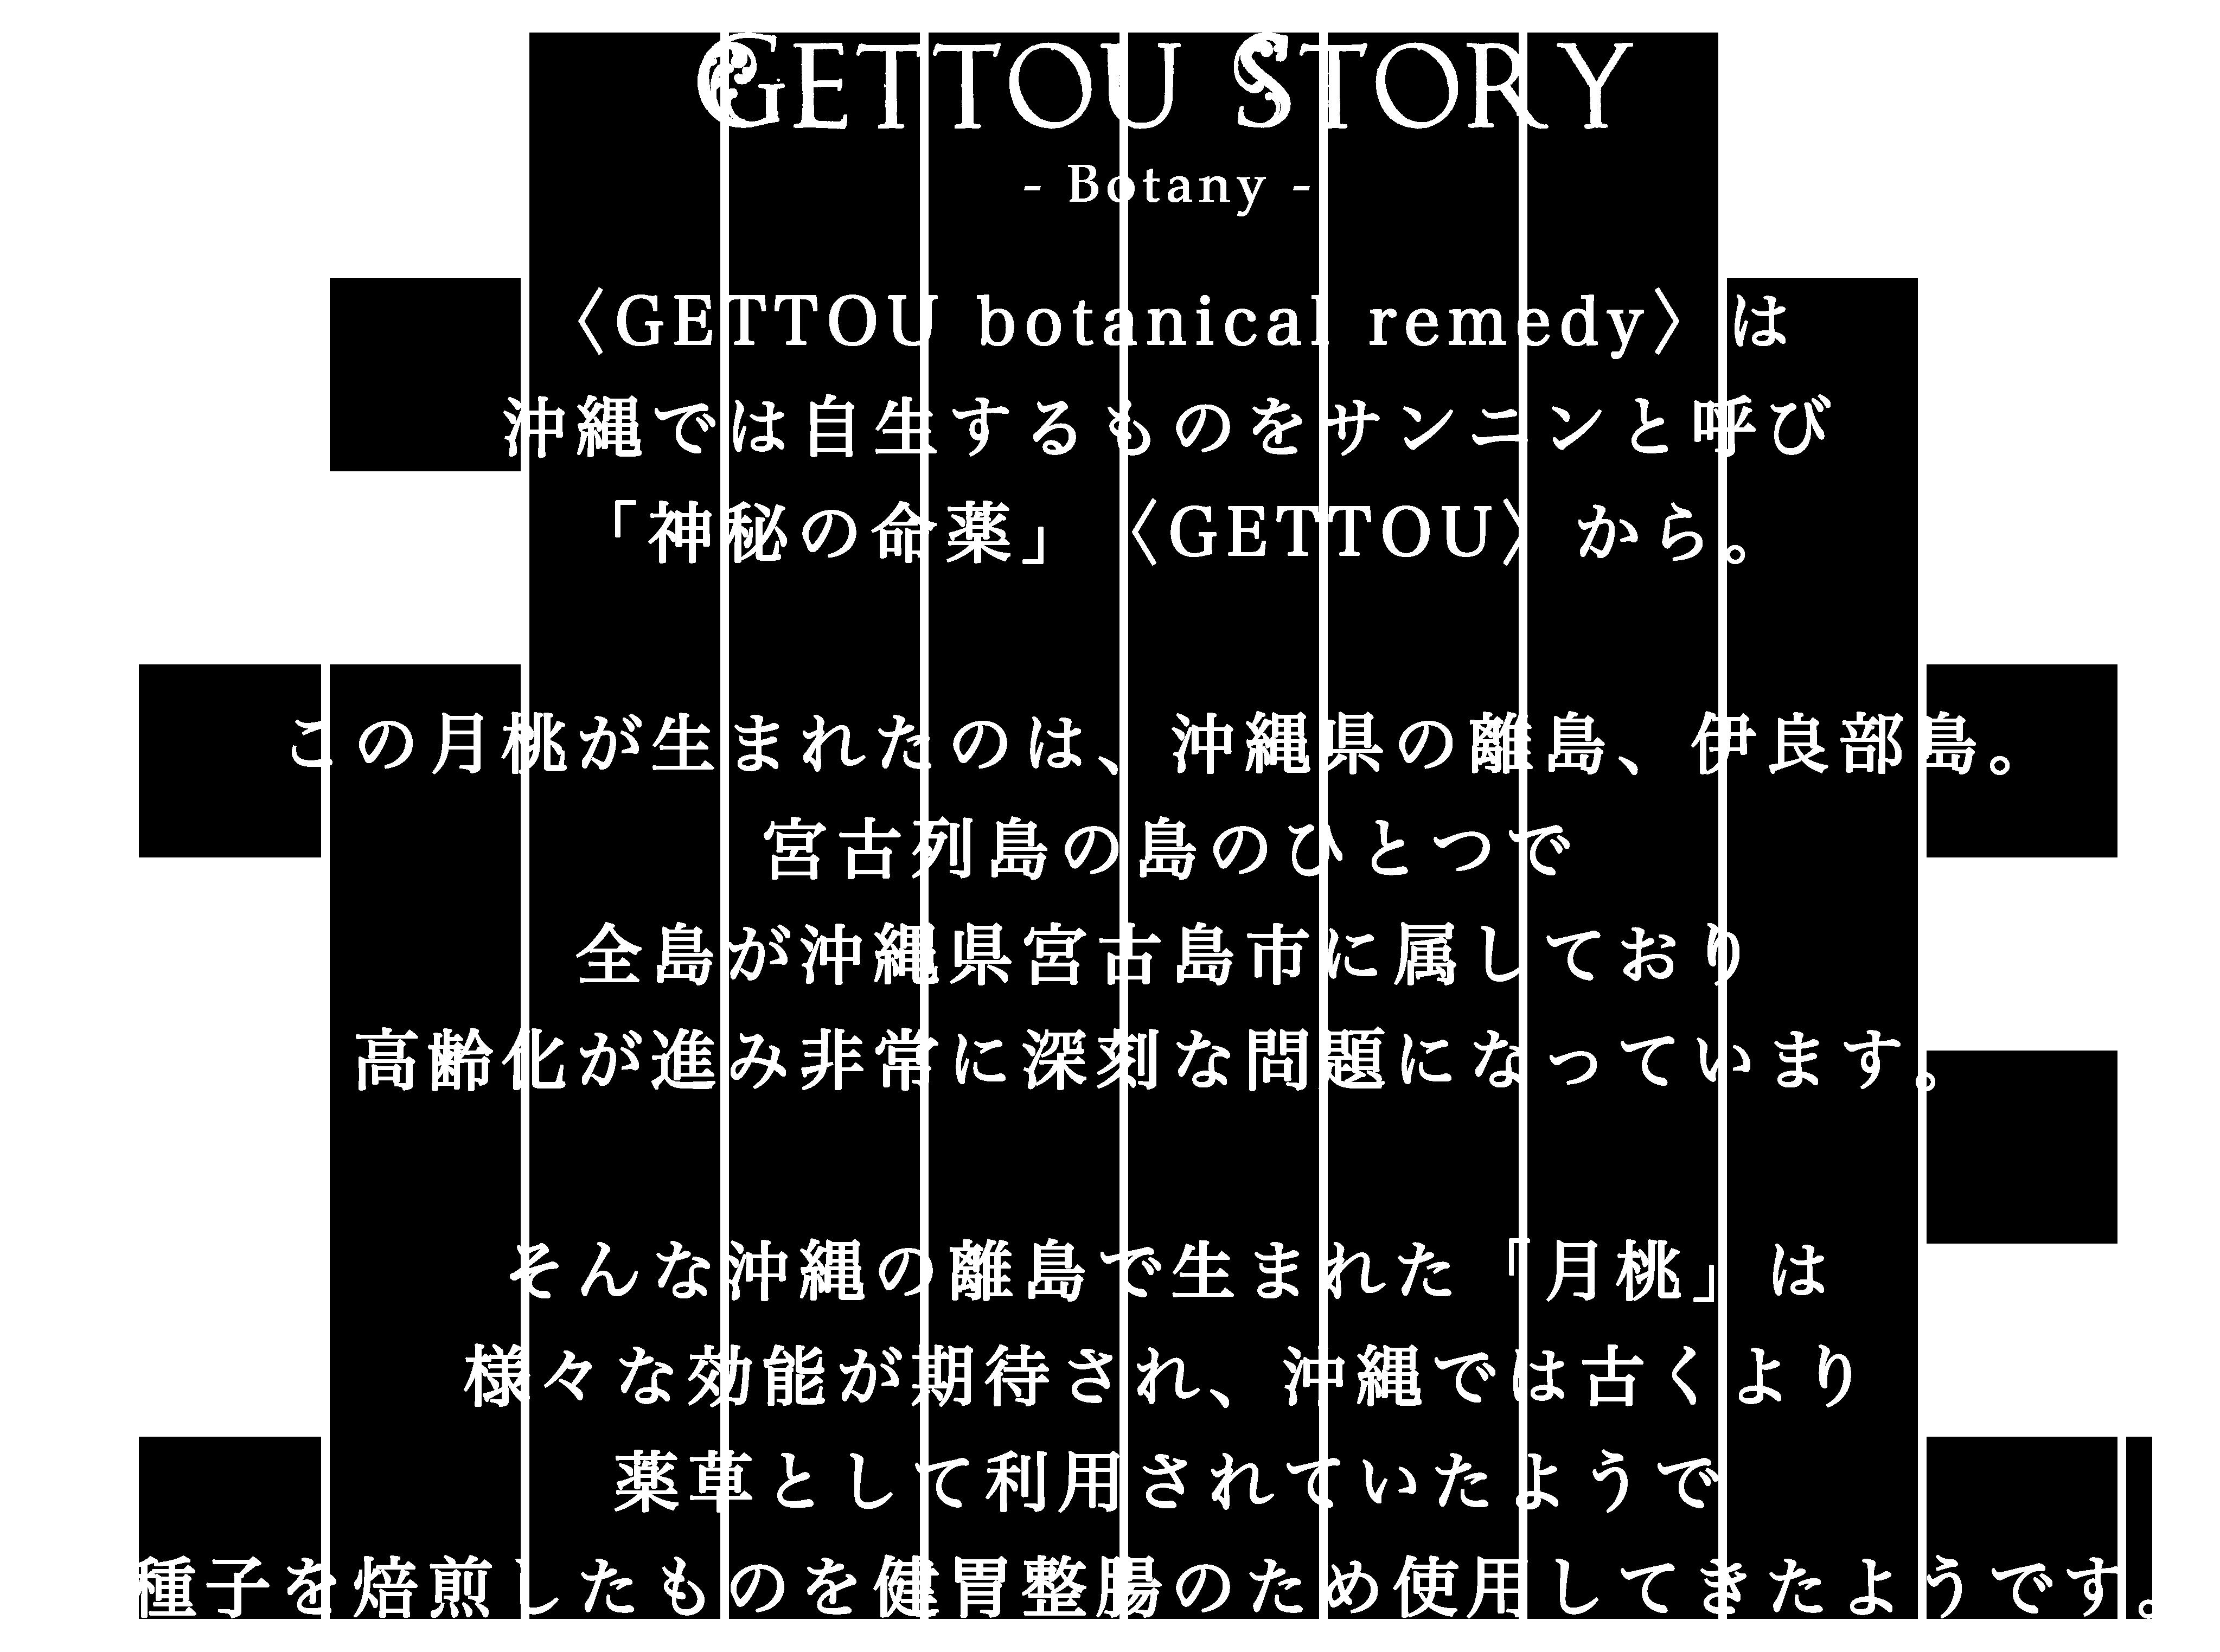 Gettou Story Botany